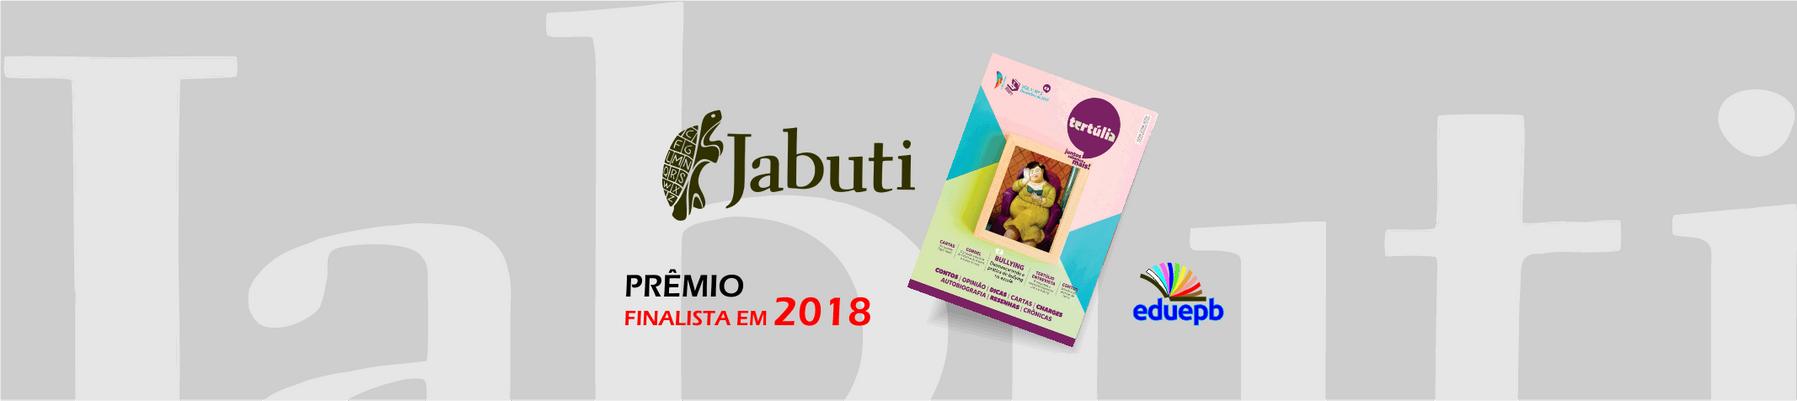 JABUTI 6.png